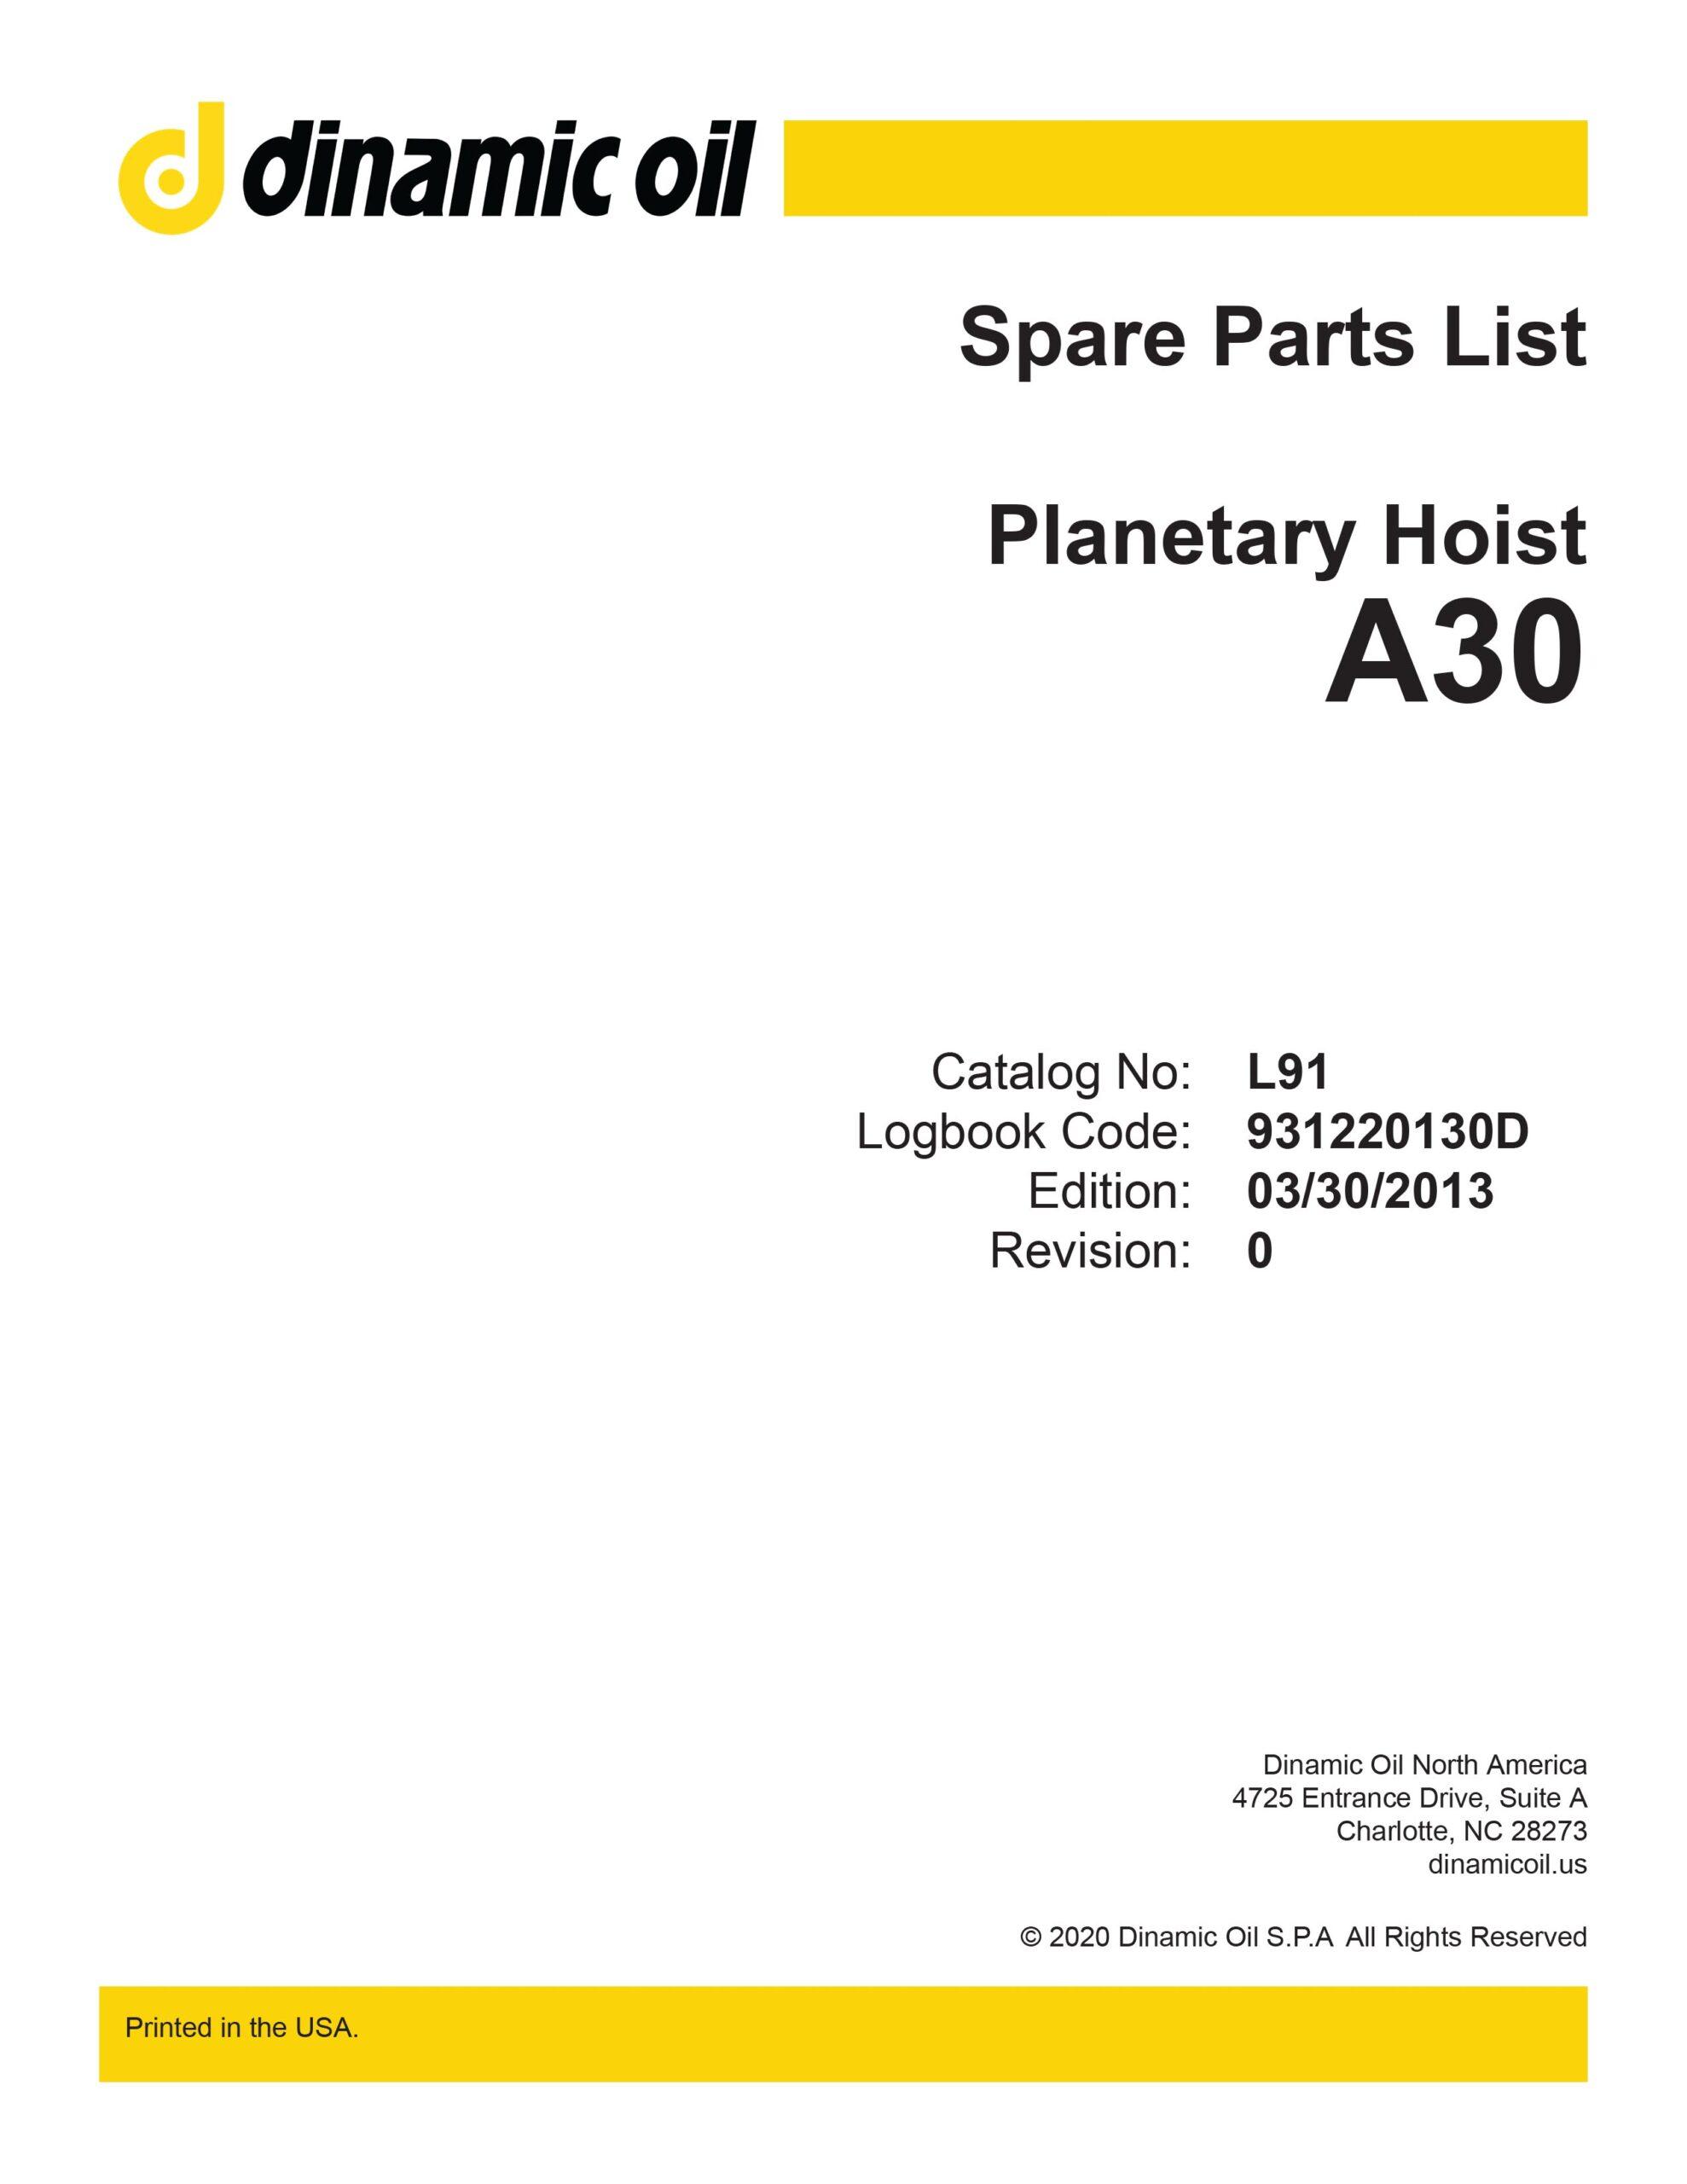 Planetary Hoist A30